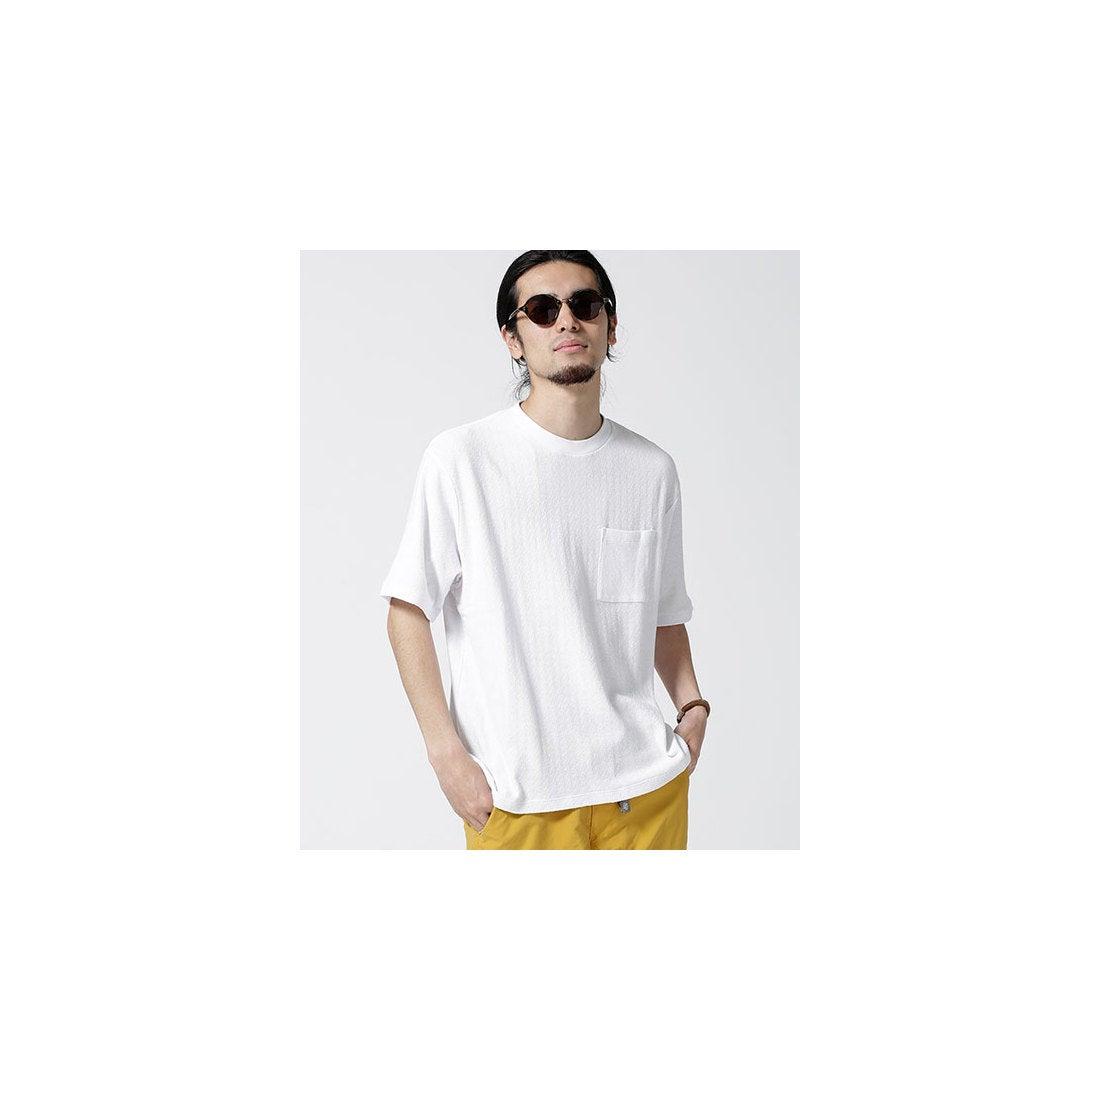 nano・universe ジャガードサーマル風梨地ビッグTシャツ(ホワイト)【返品不可商品】